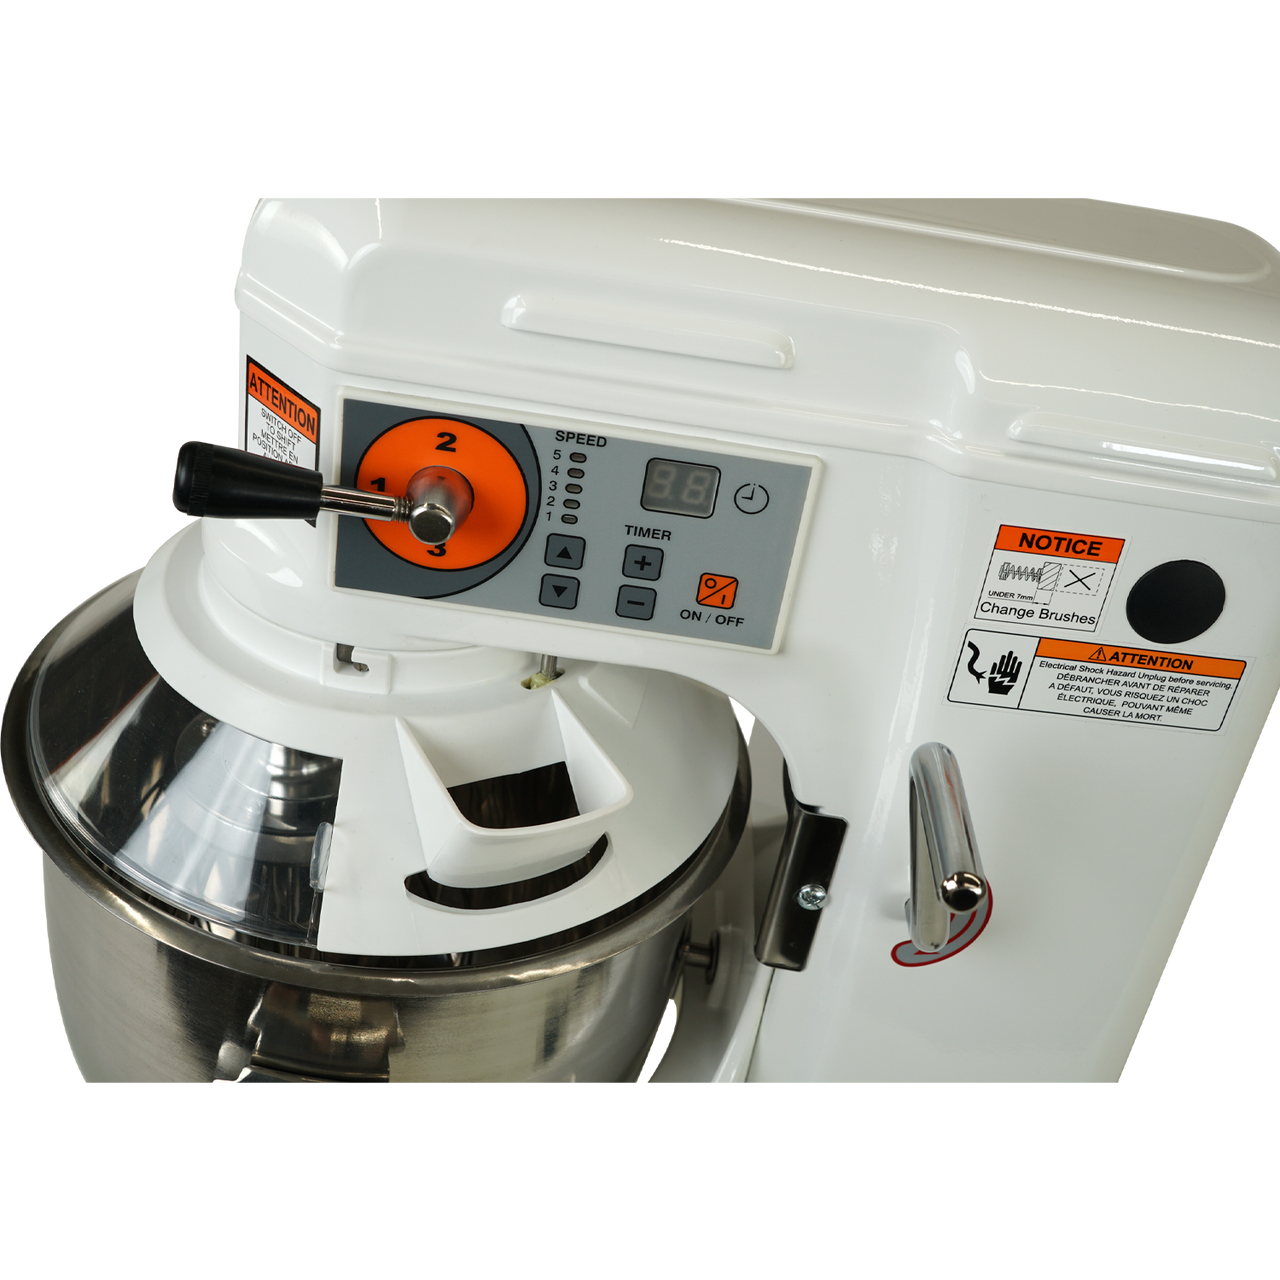 Pour Chute, AE-10DCA 10 Quart Countertop Planetary Mixer, Commercial Mixer